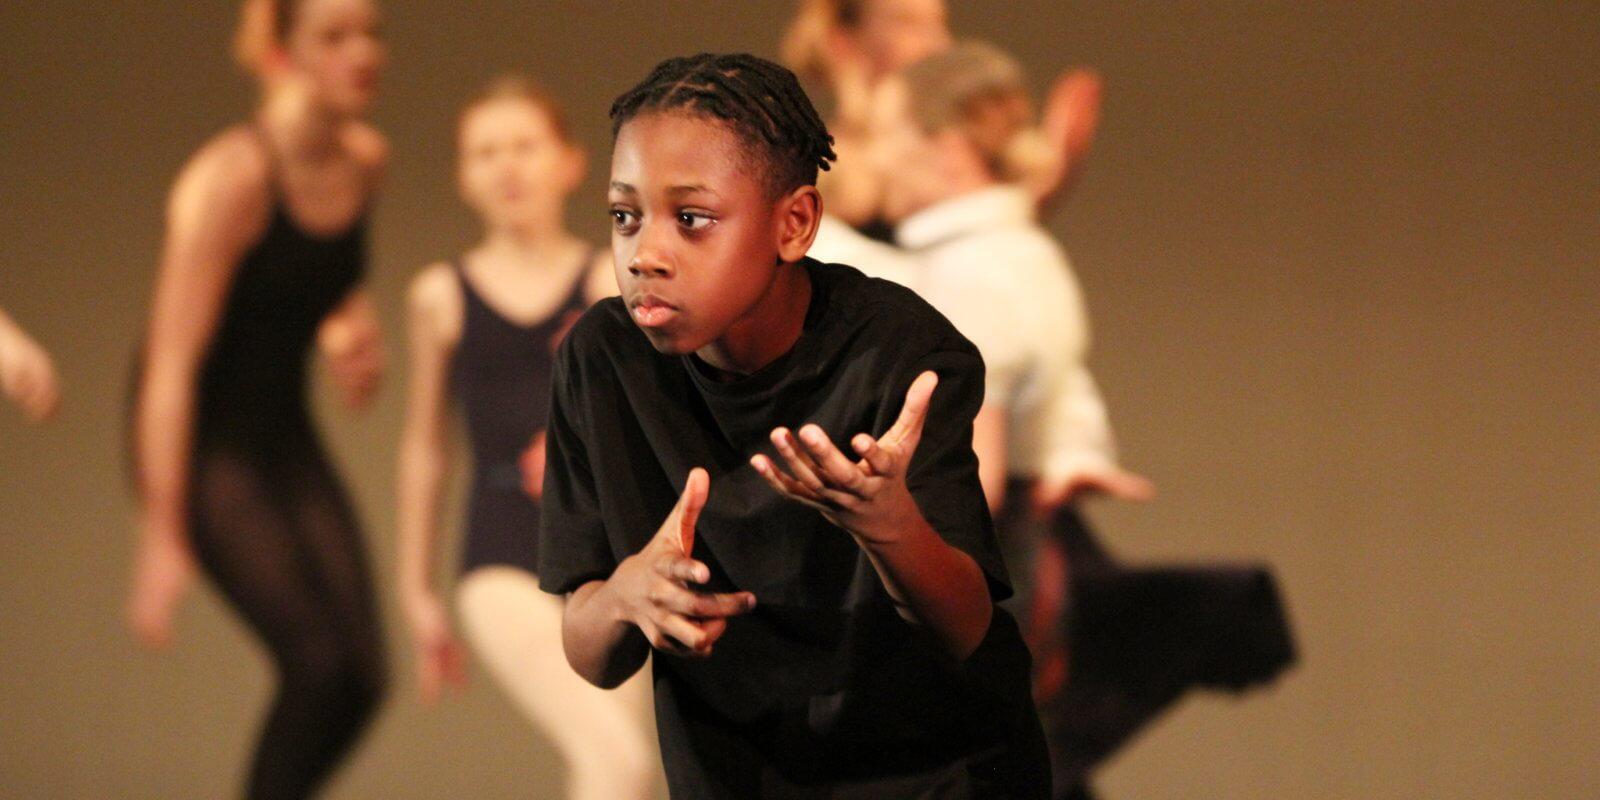 Arts1 Gallery: Dare to Dance 'RAD Centenary Celebration' 14